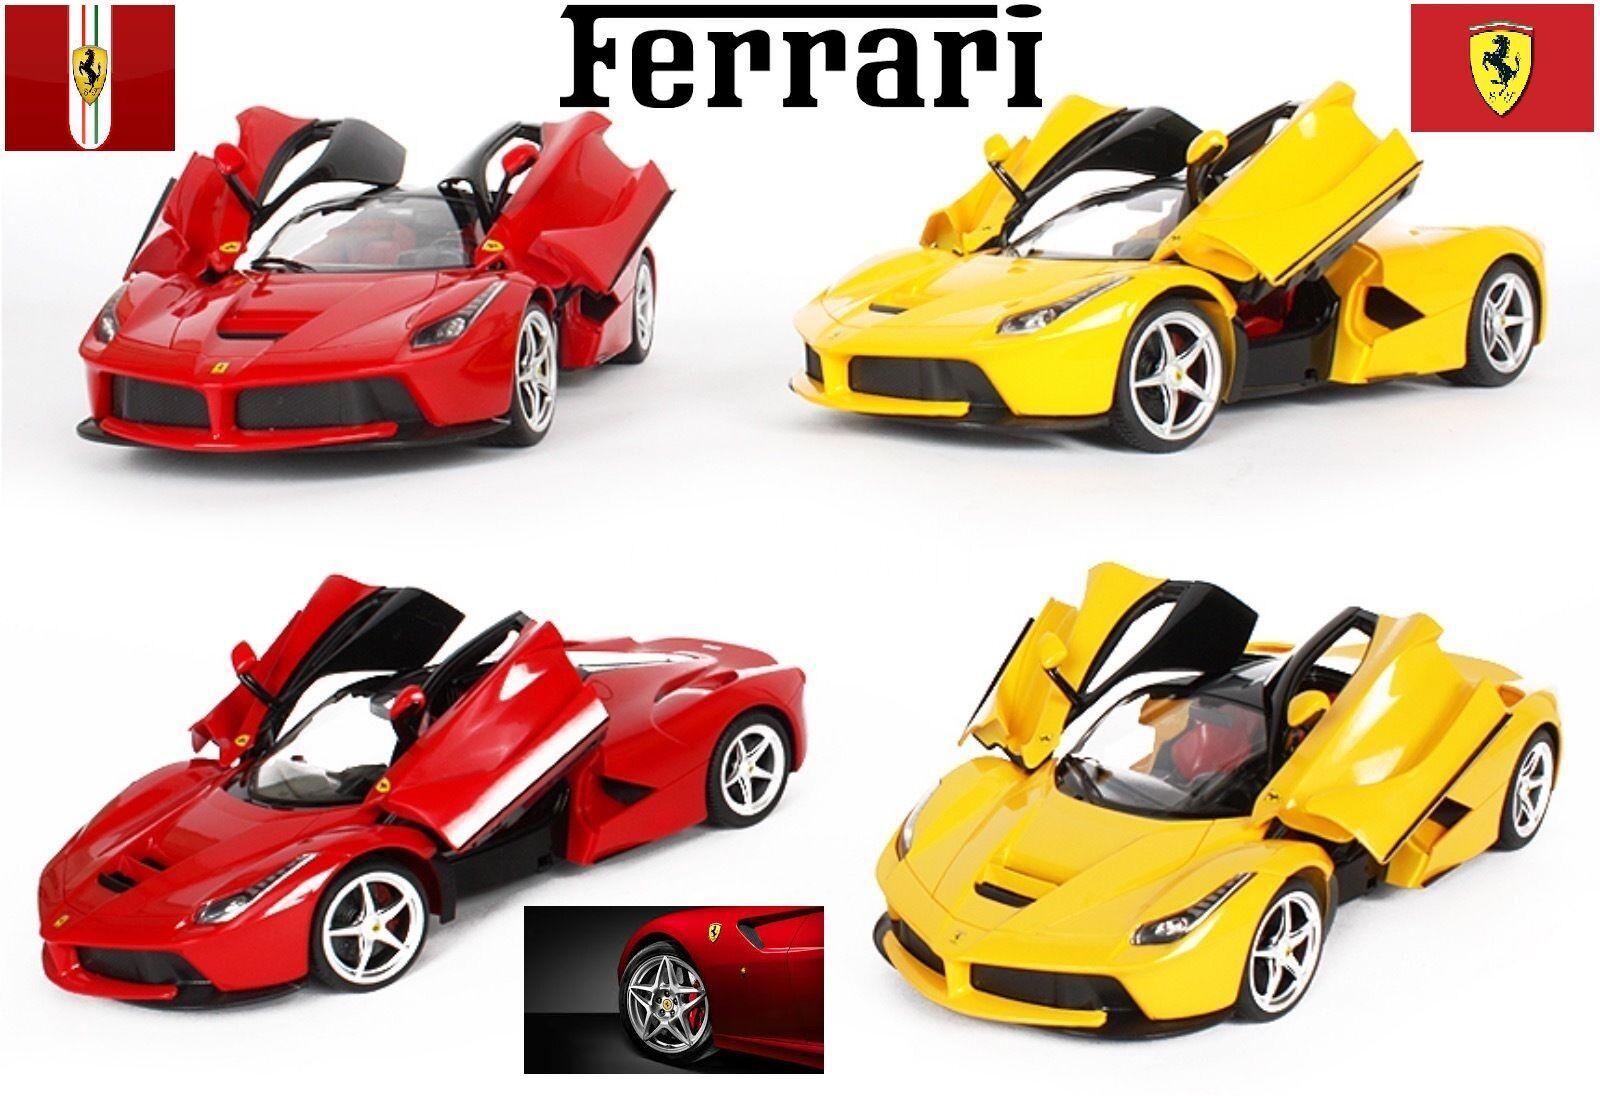 LA Ferrari Licensed Radio Remote Control bil 1 14 Scale röd och gul RC Toy Gift